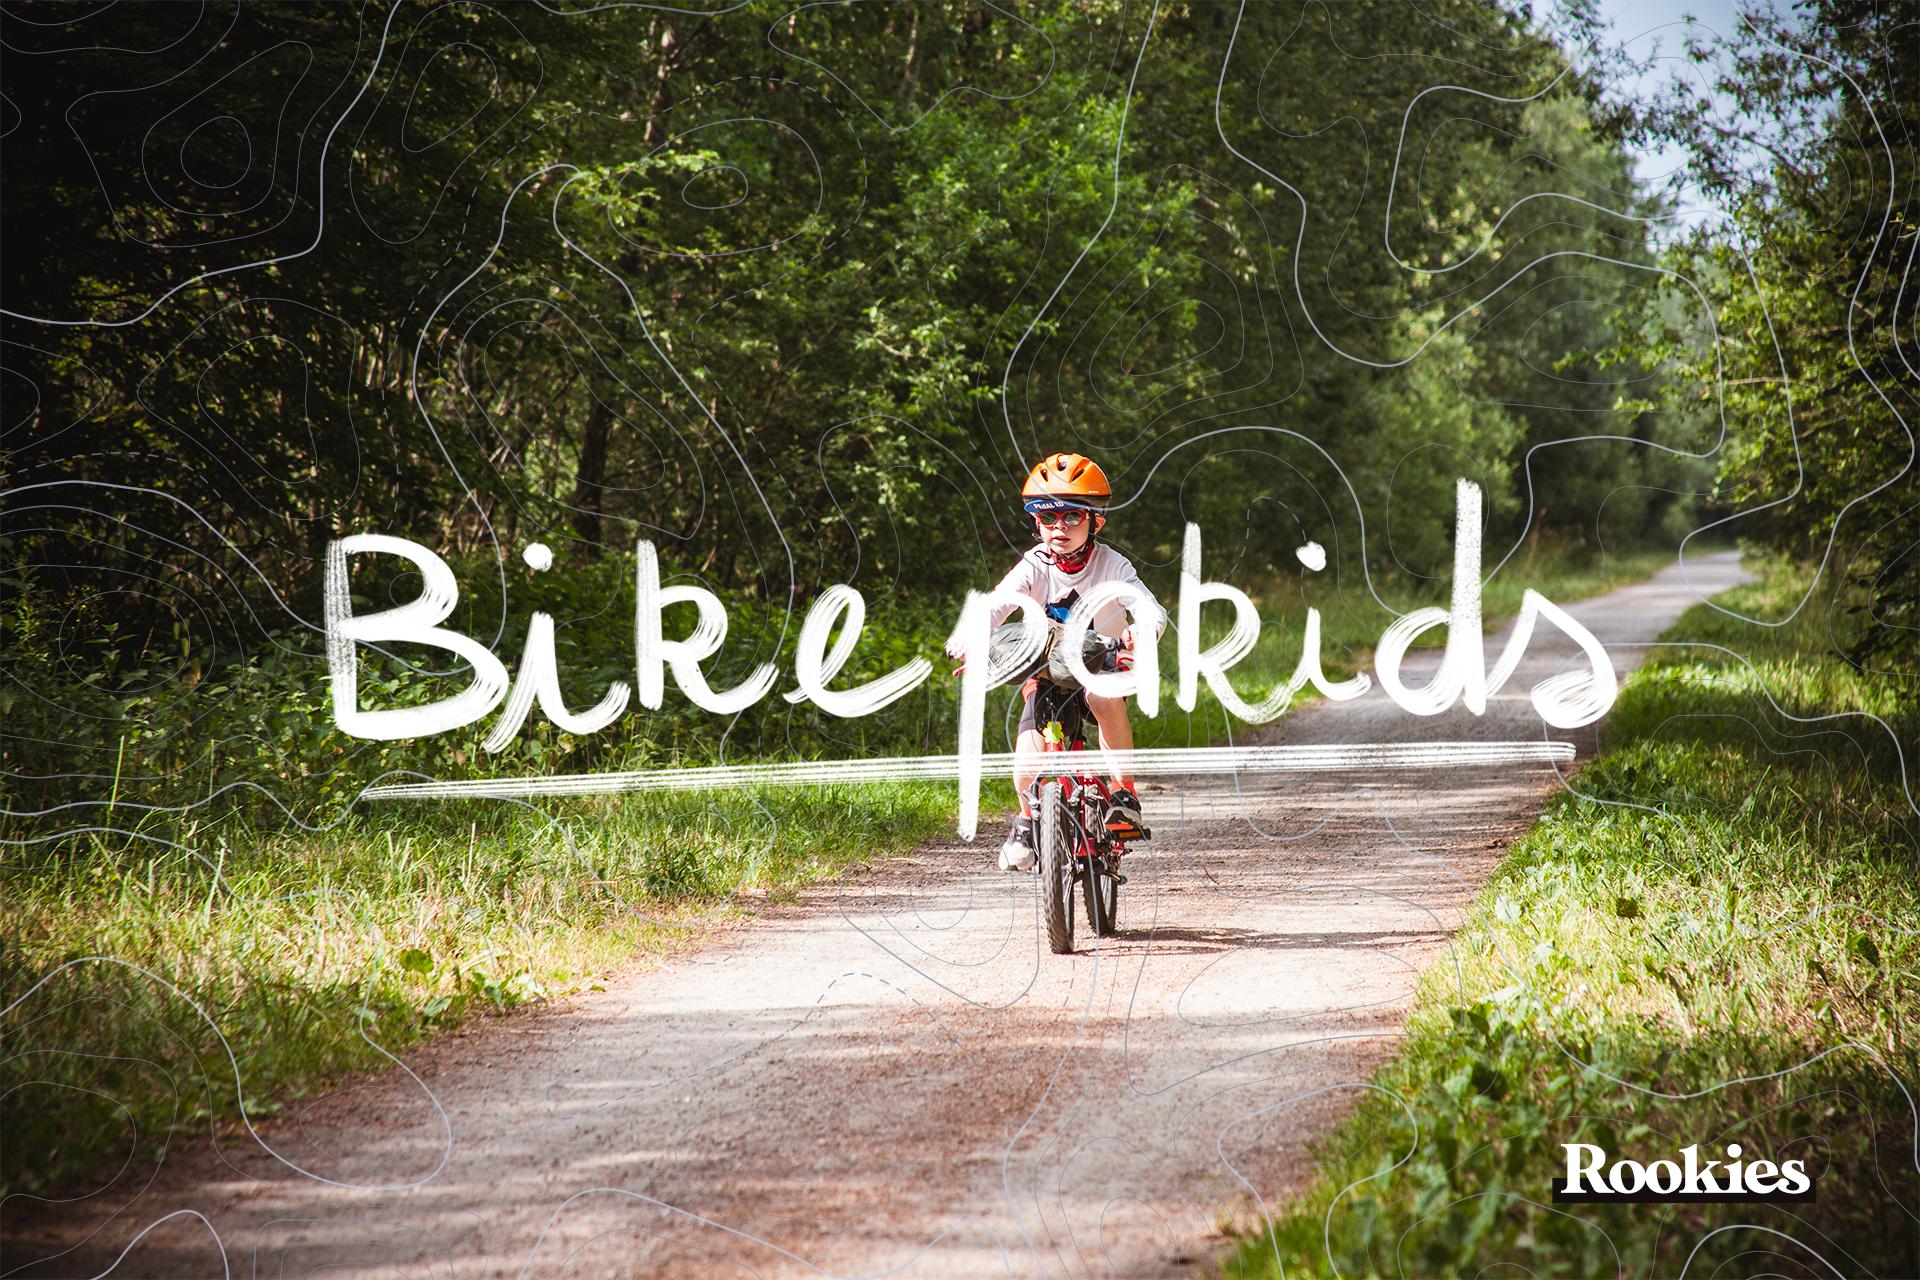 Bikepakids by Christophe & Cameron.